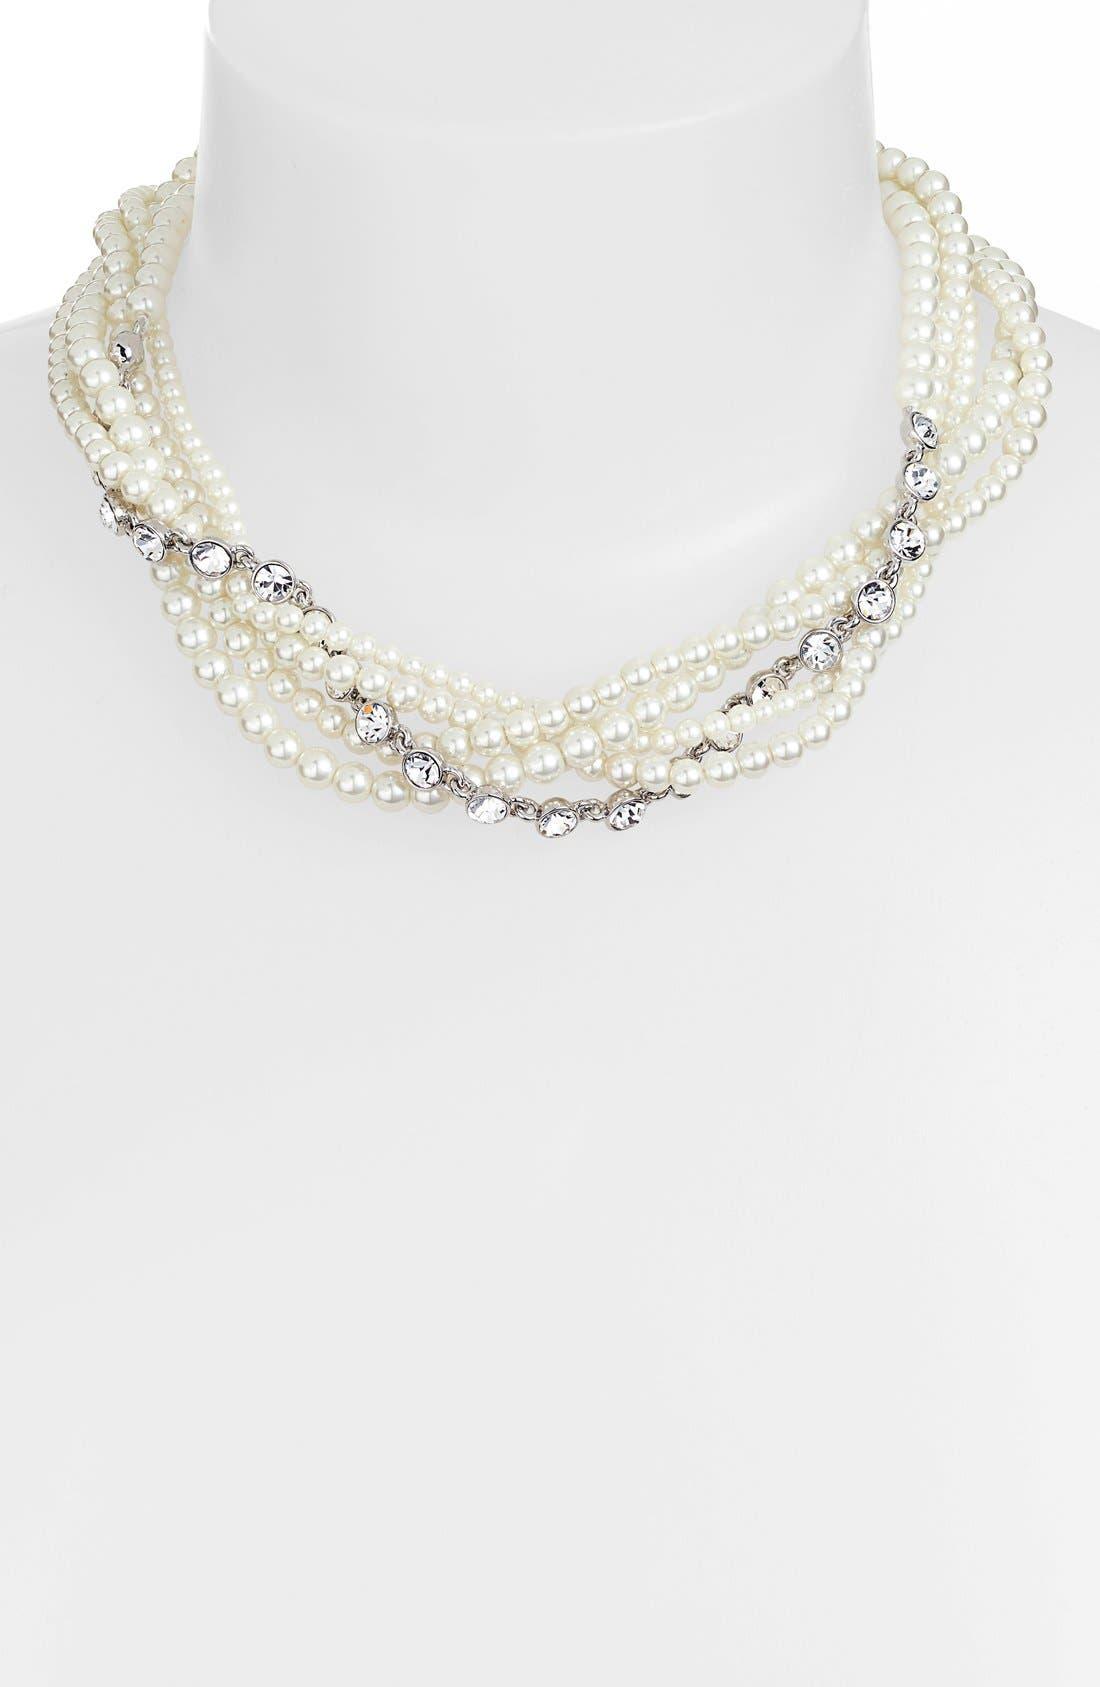 Main Image - Givenchy Faux Pearl & Crystal Torsade Necklace